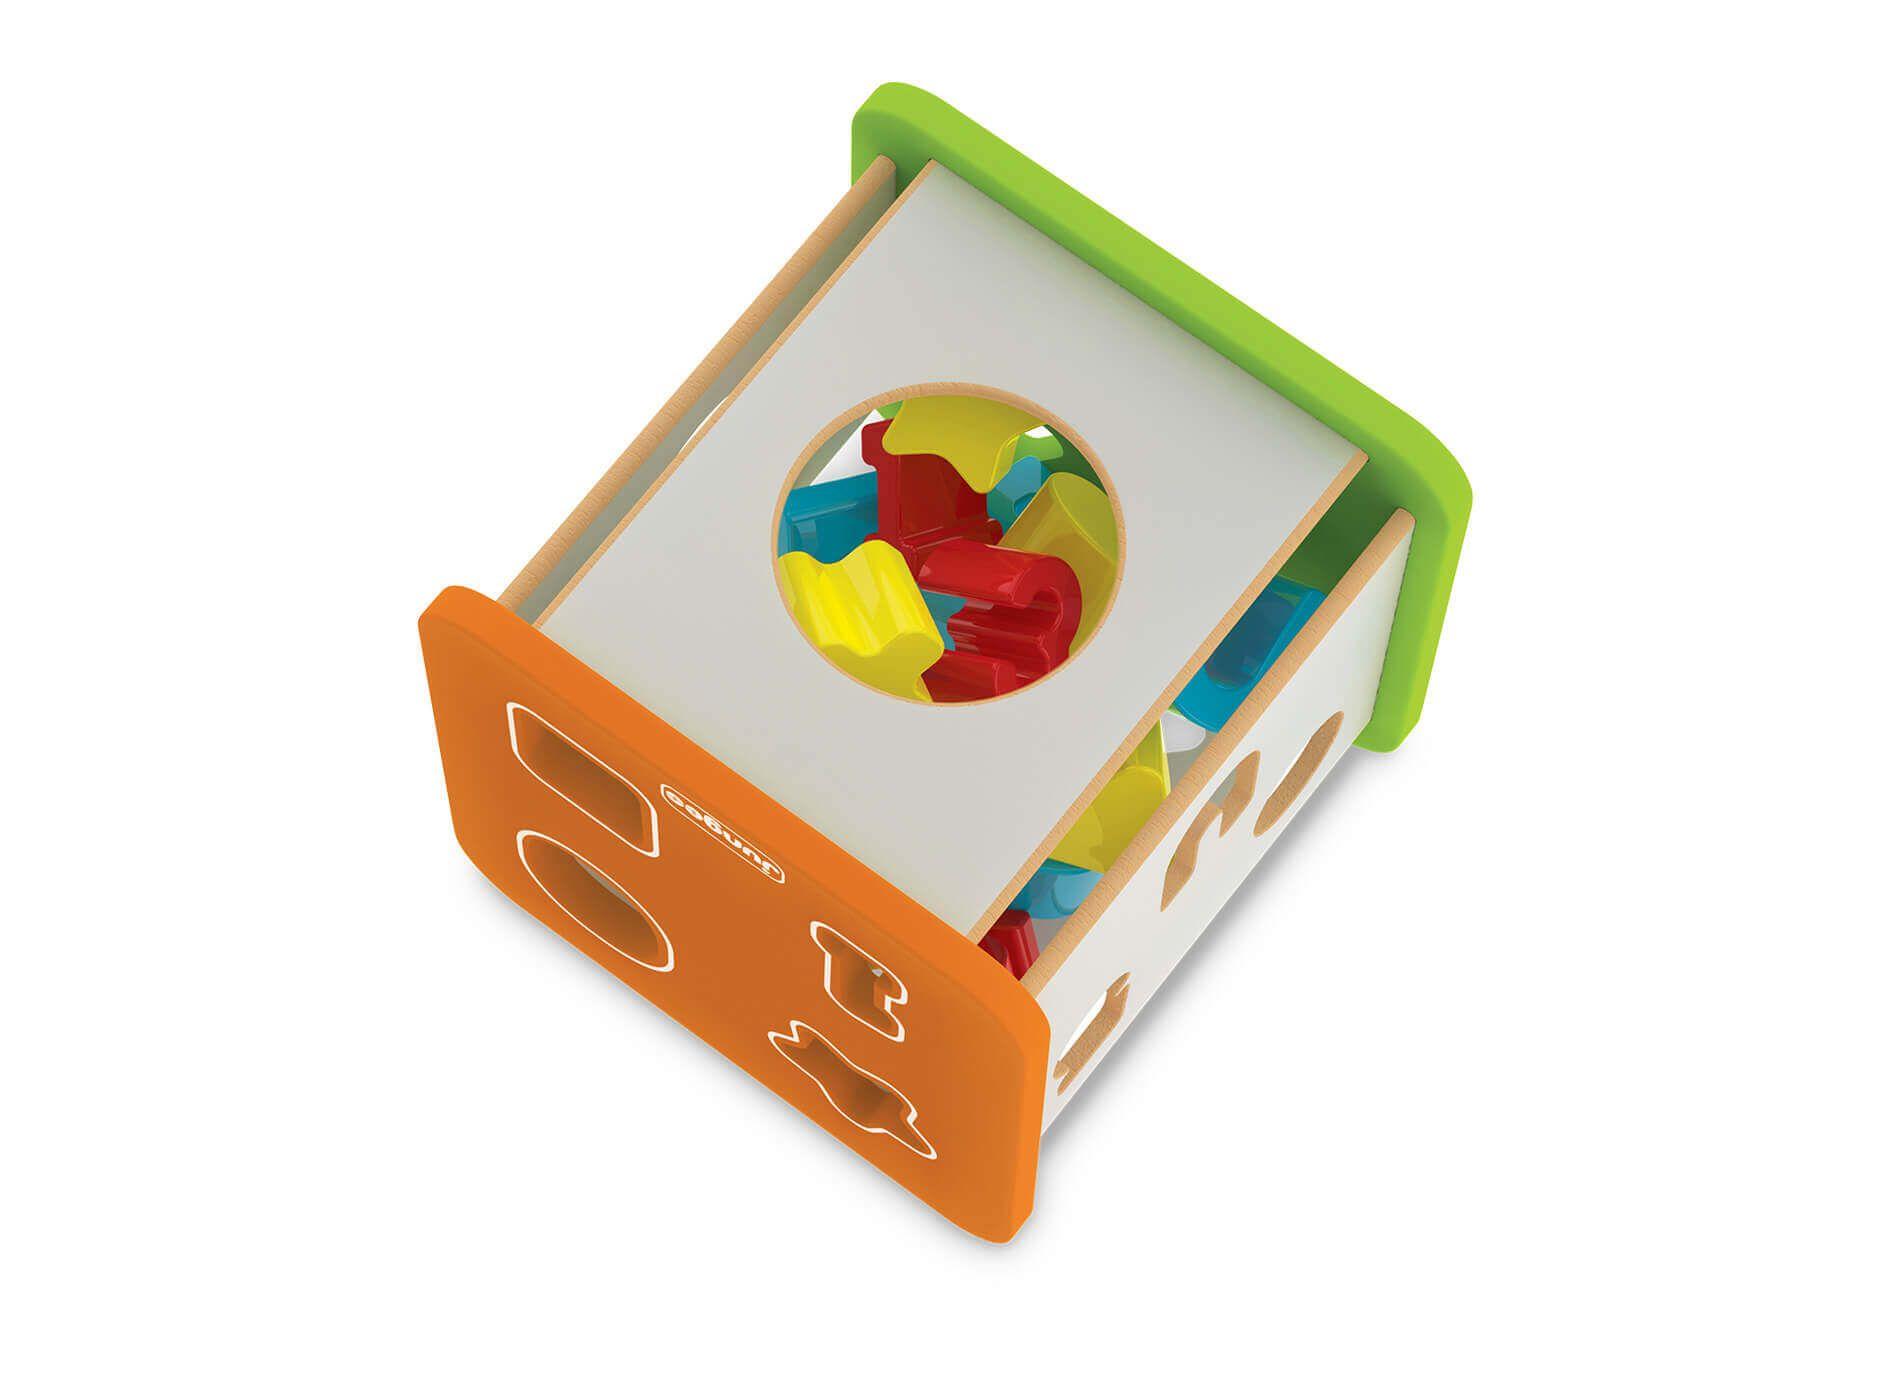 Super Cubo Didatico Formas Letras E Numeros 850 Junges